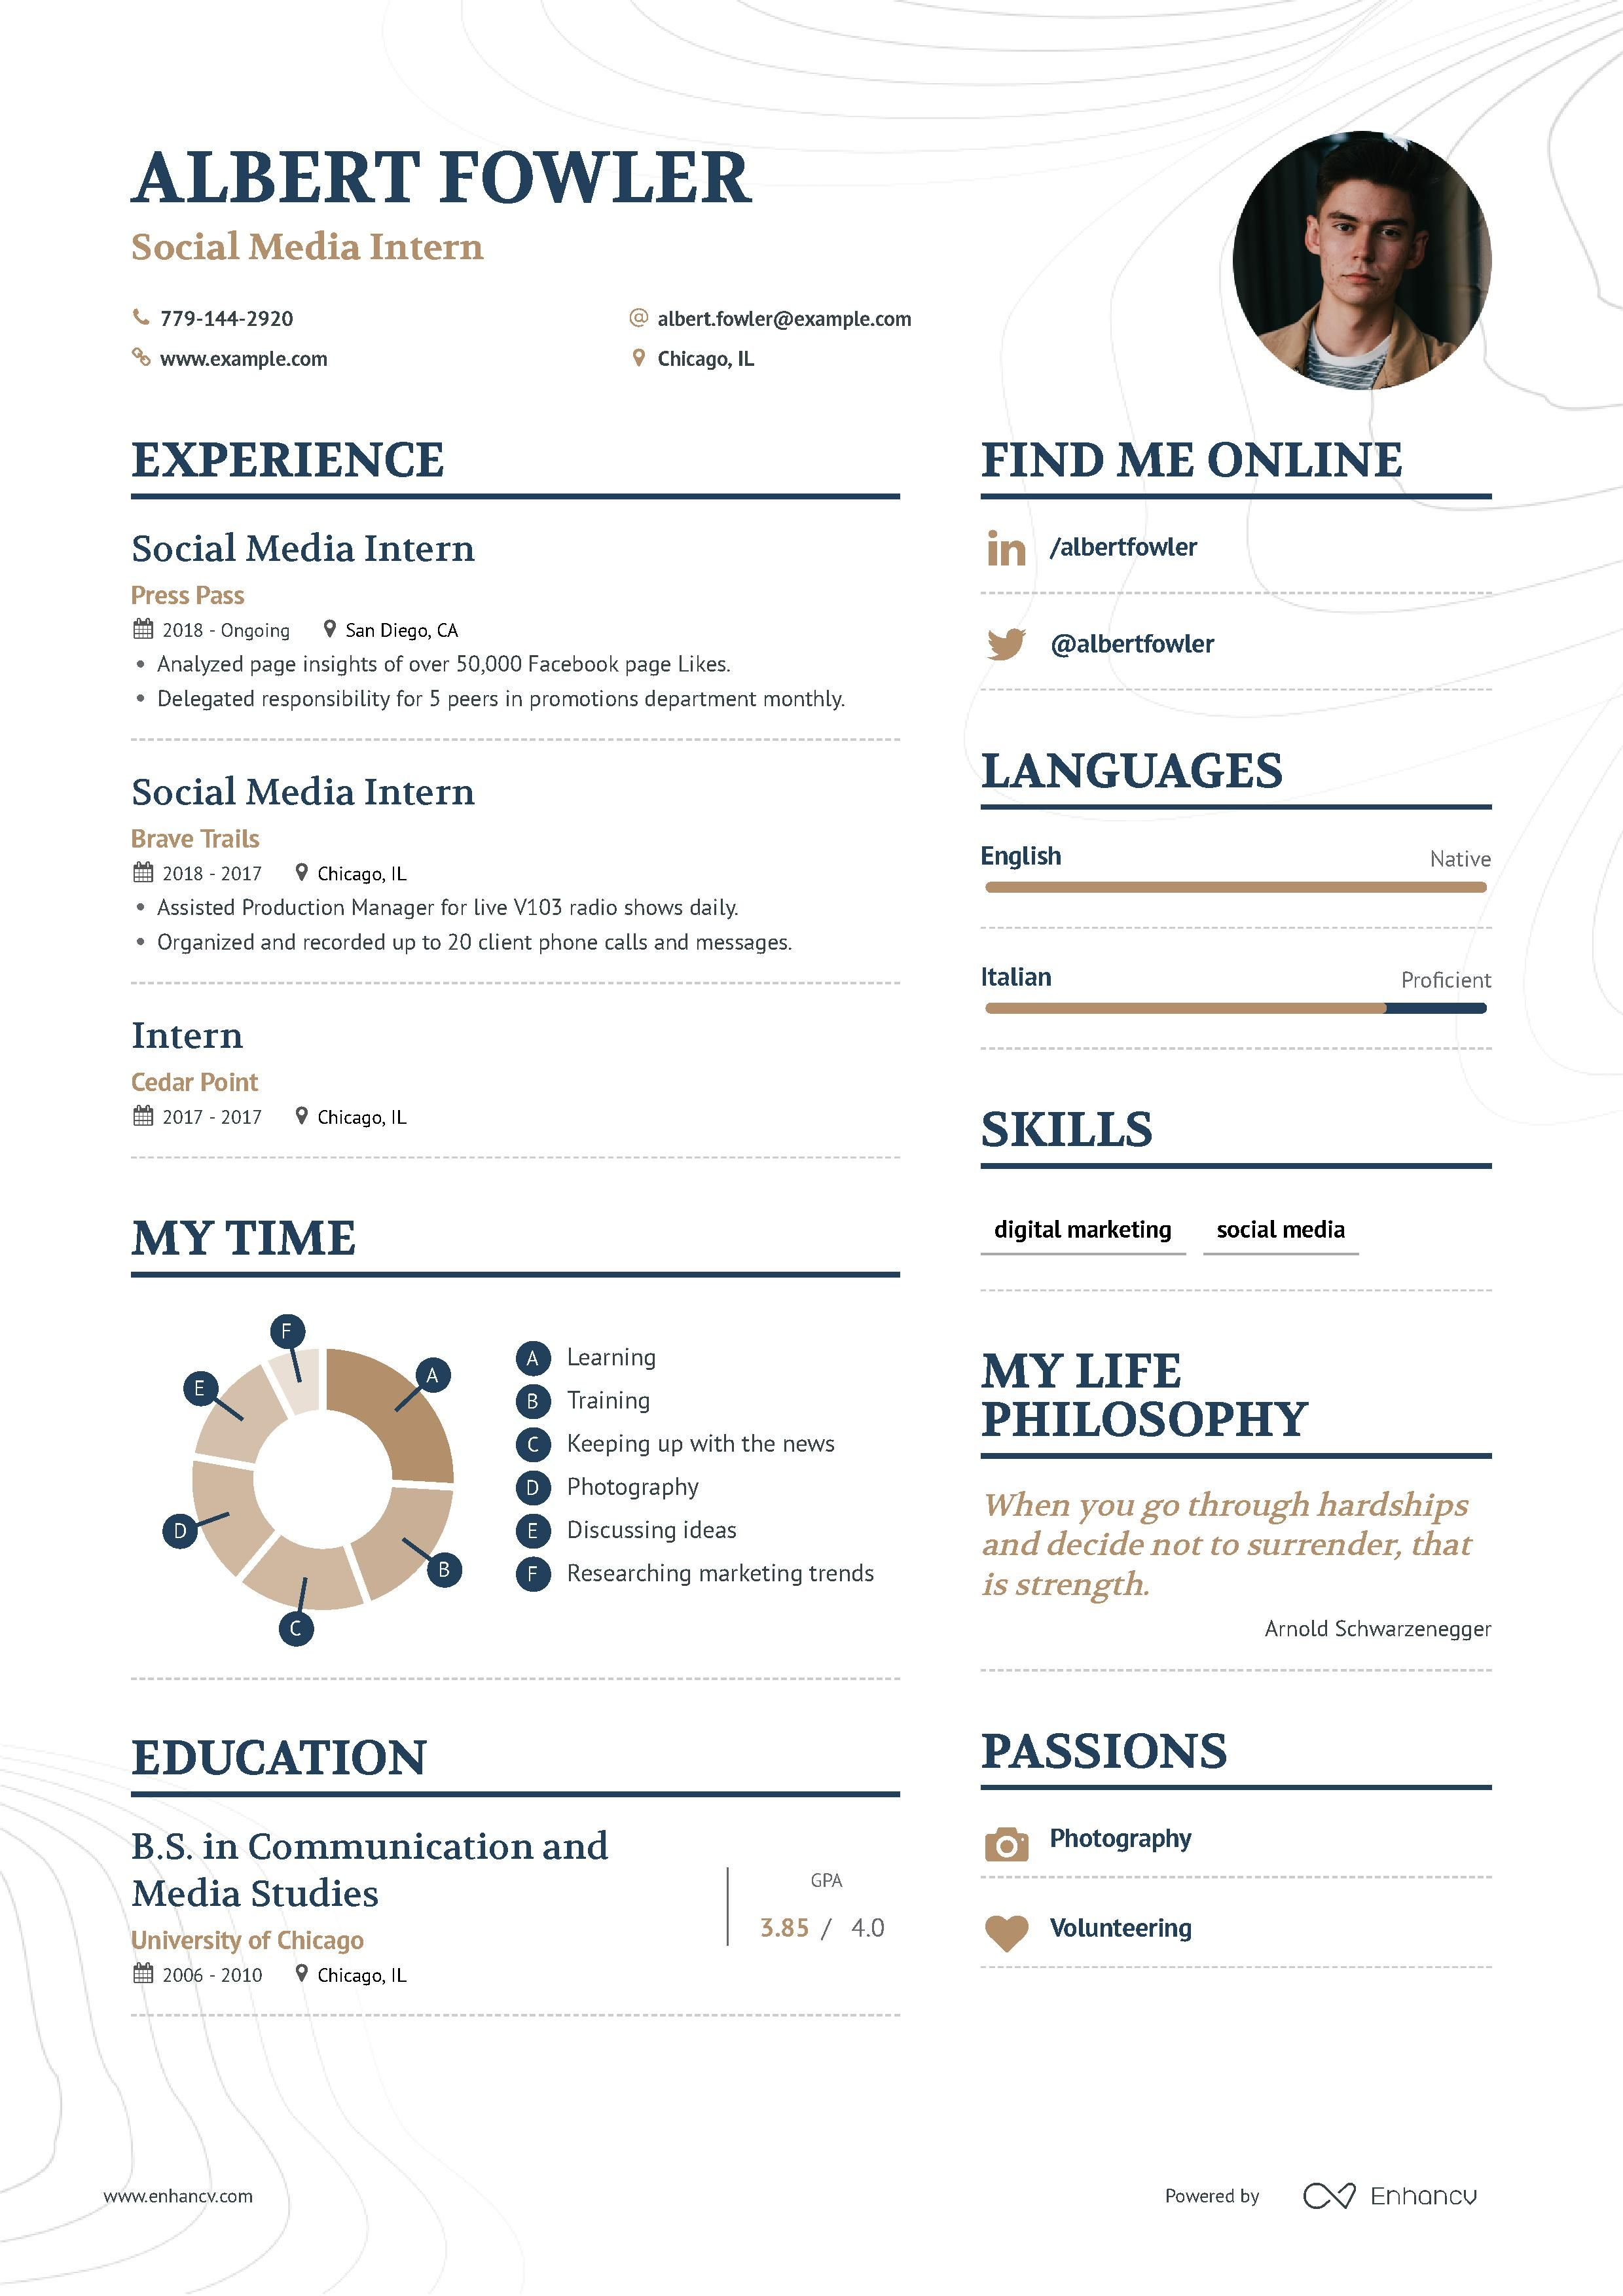 The ultimate 2019 guide for Social Media Intern resume